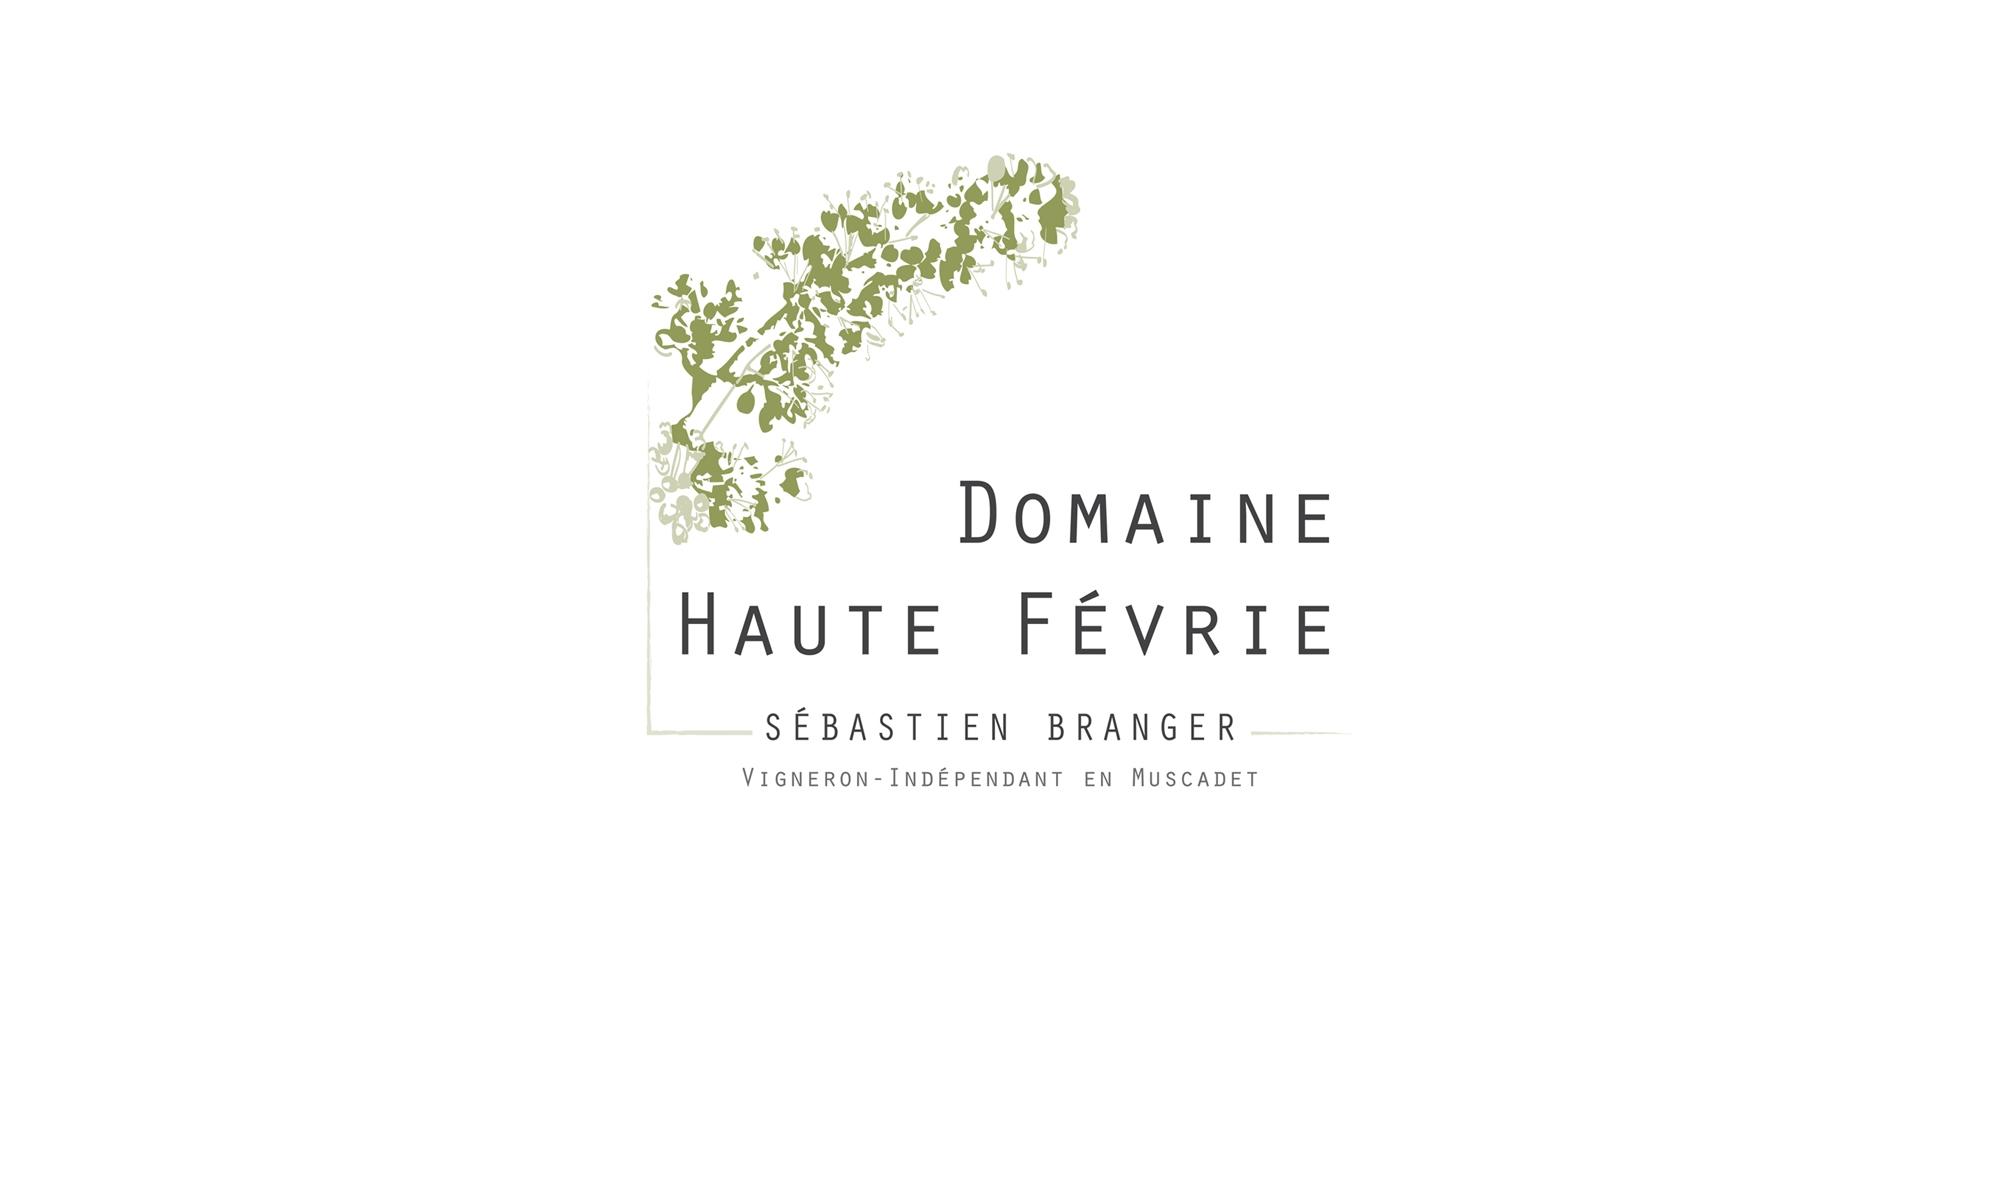 Domaine Haute Fevrie